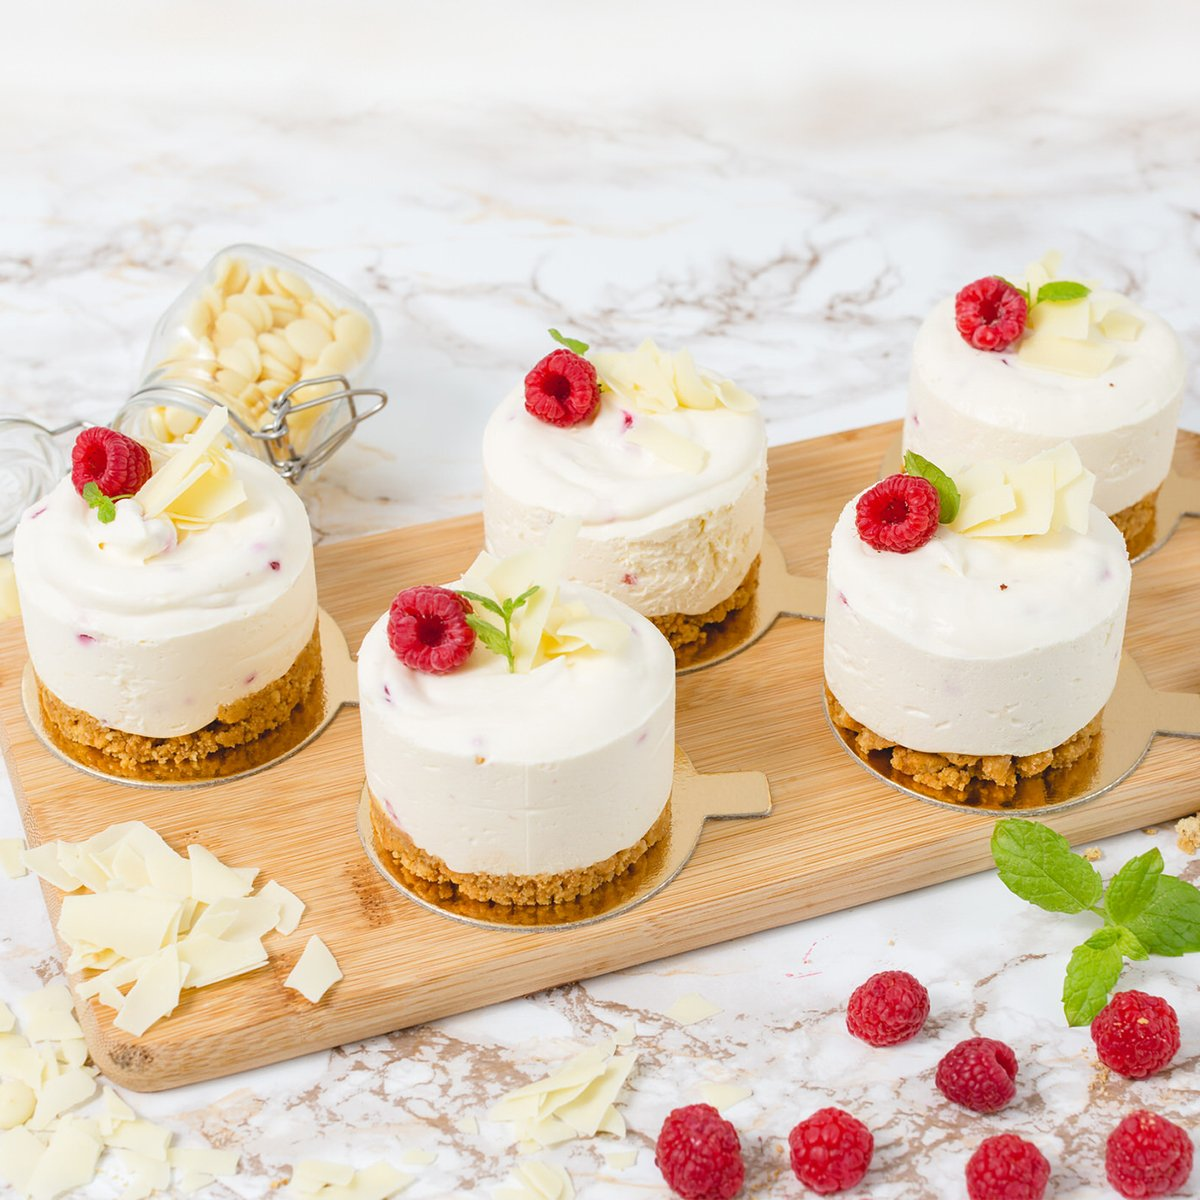 Set of 5 Individual White Chocolate and Raspberry Cheesecakes | Merci Beaucoup Cakes